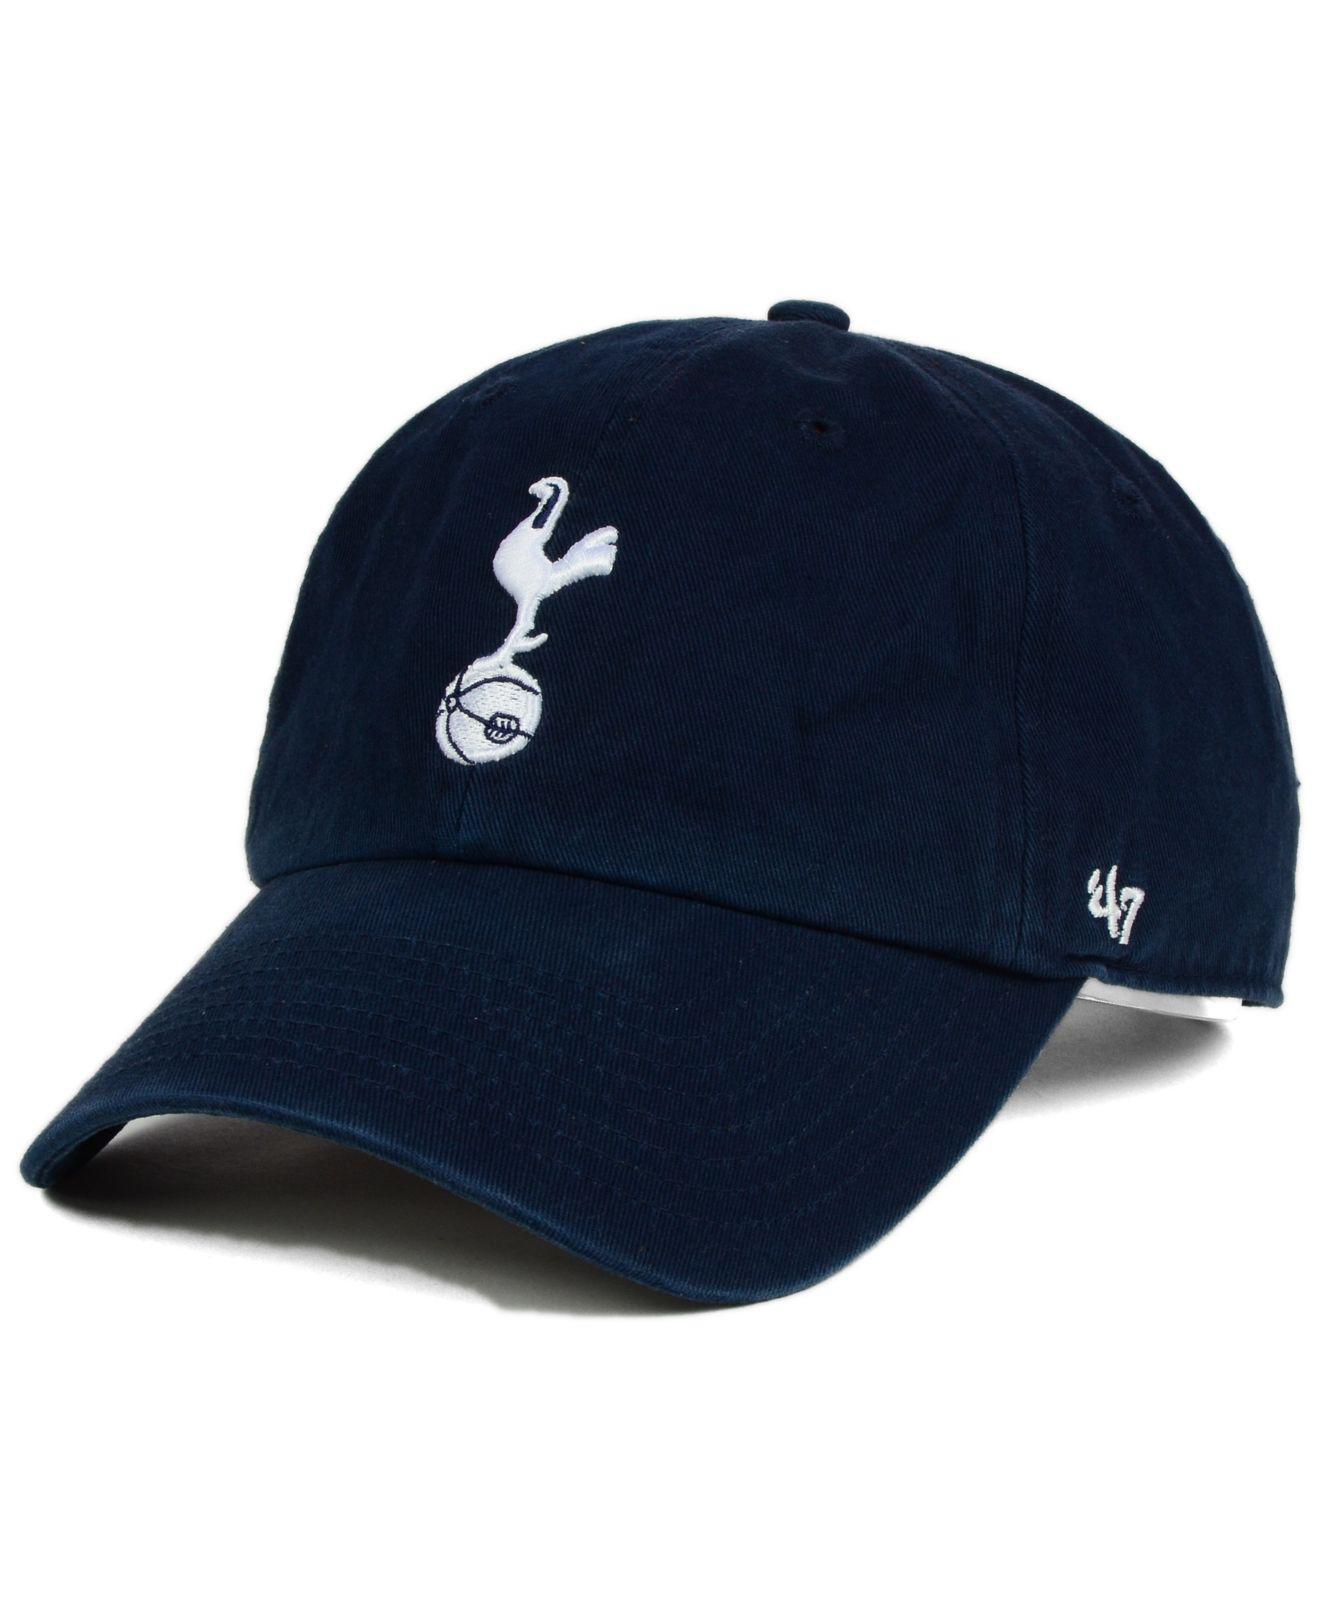 816f222ef49 Lyst - 47 Brand Tottenham Hotspur Fc Clean Up Cap in Blue for Men